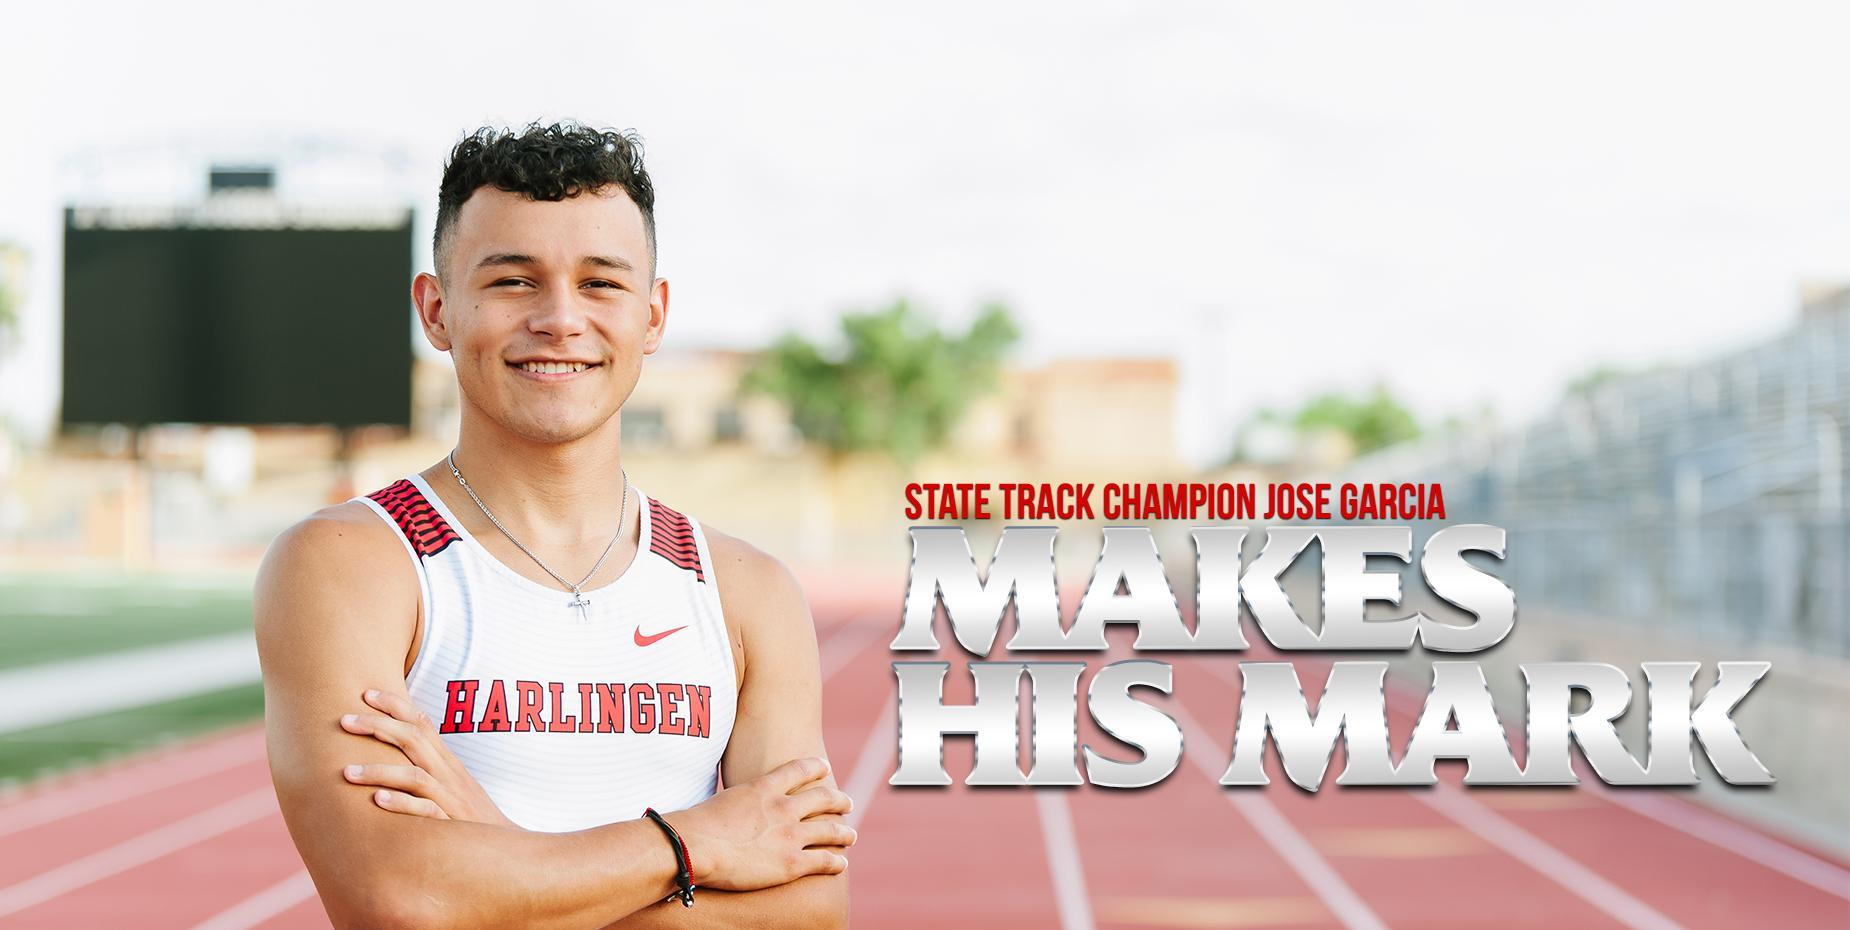 State track champion Jose Garcia makes his mark